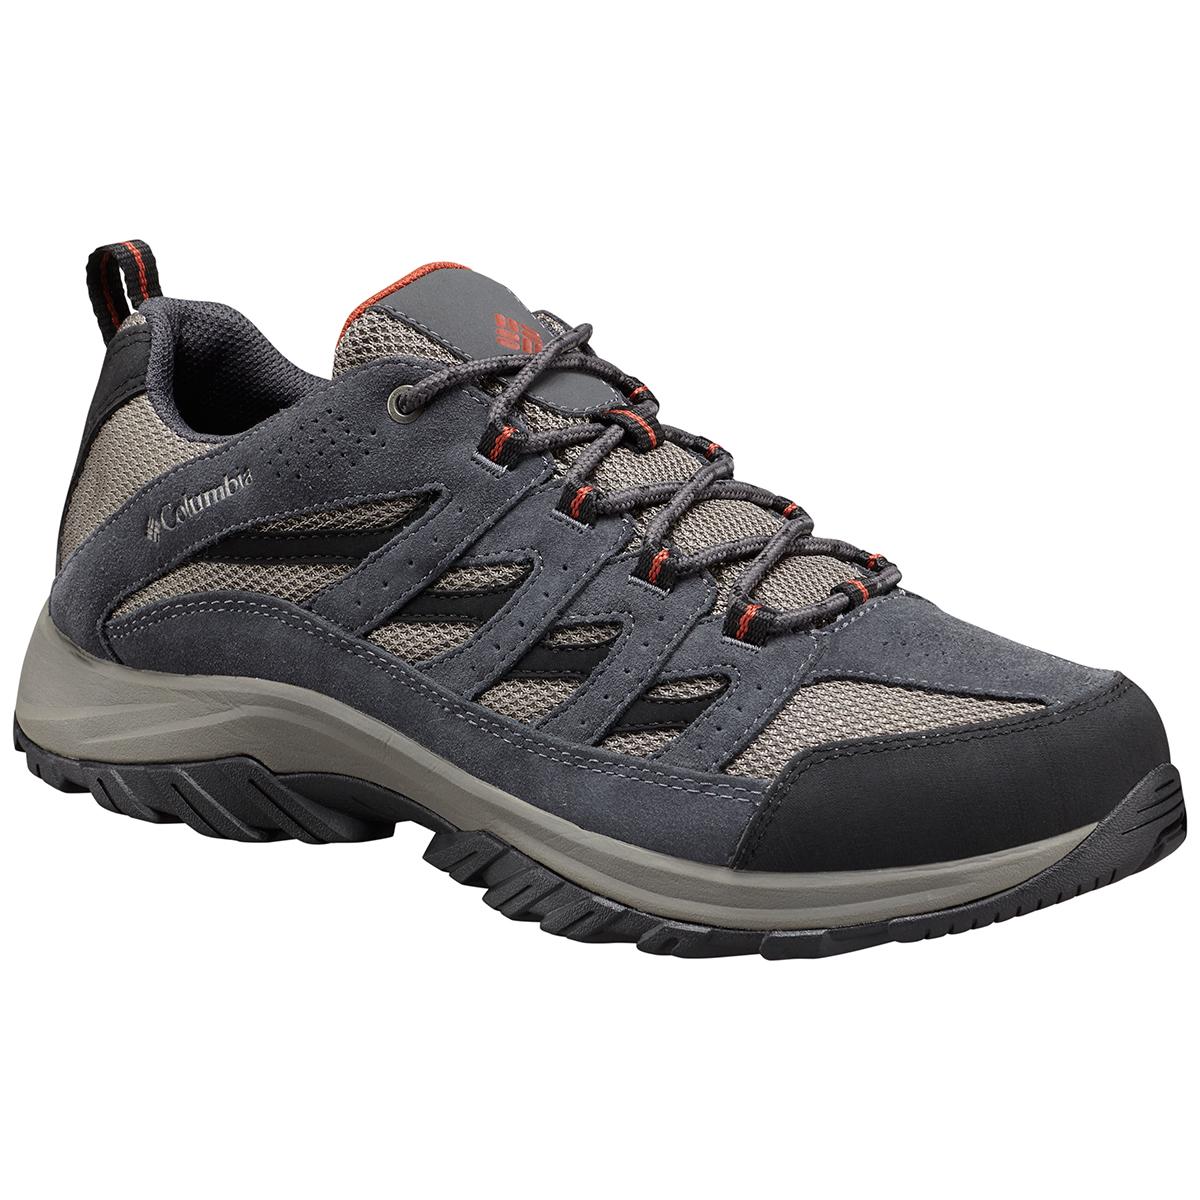 Columbia Men's Crestwood Low Waterproof Hiking Shoes - Black, 9